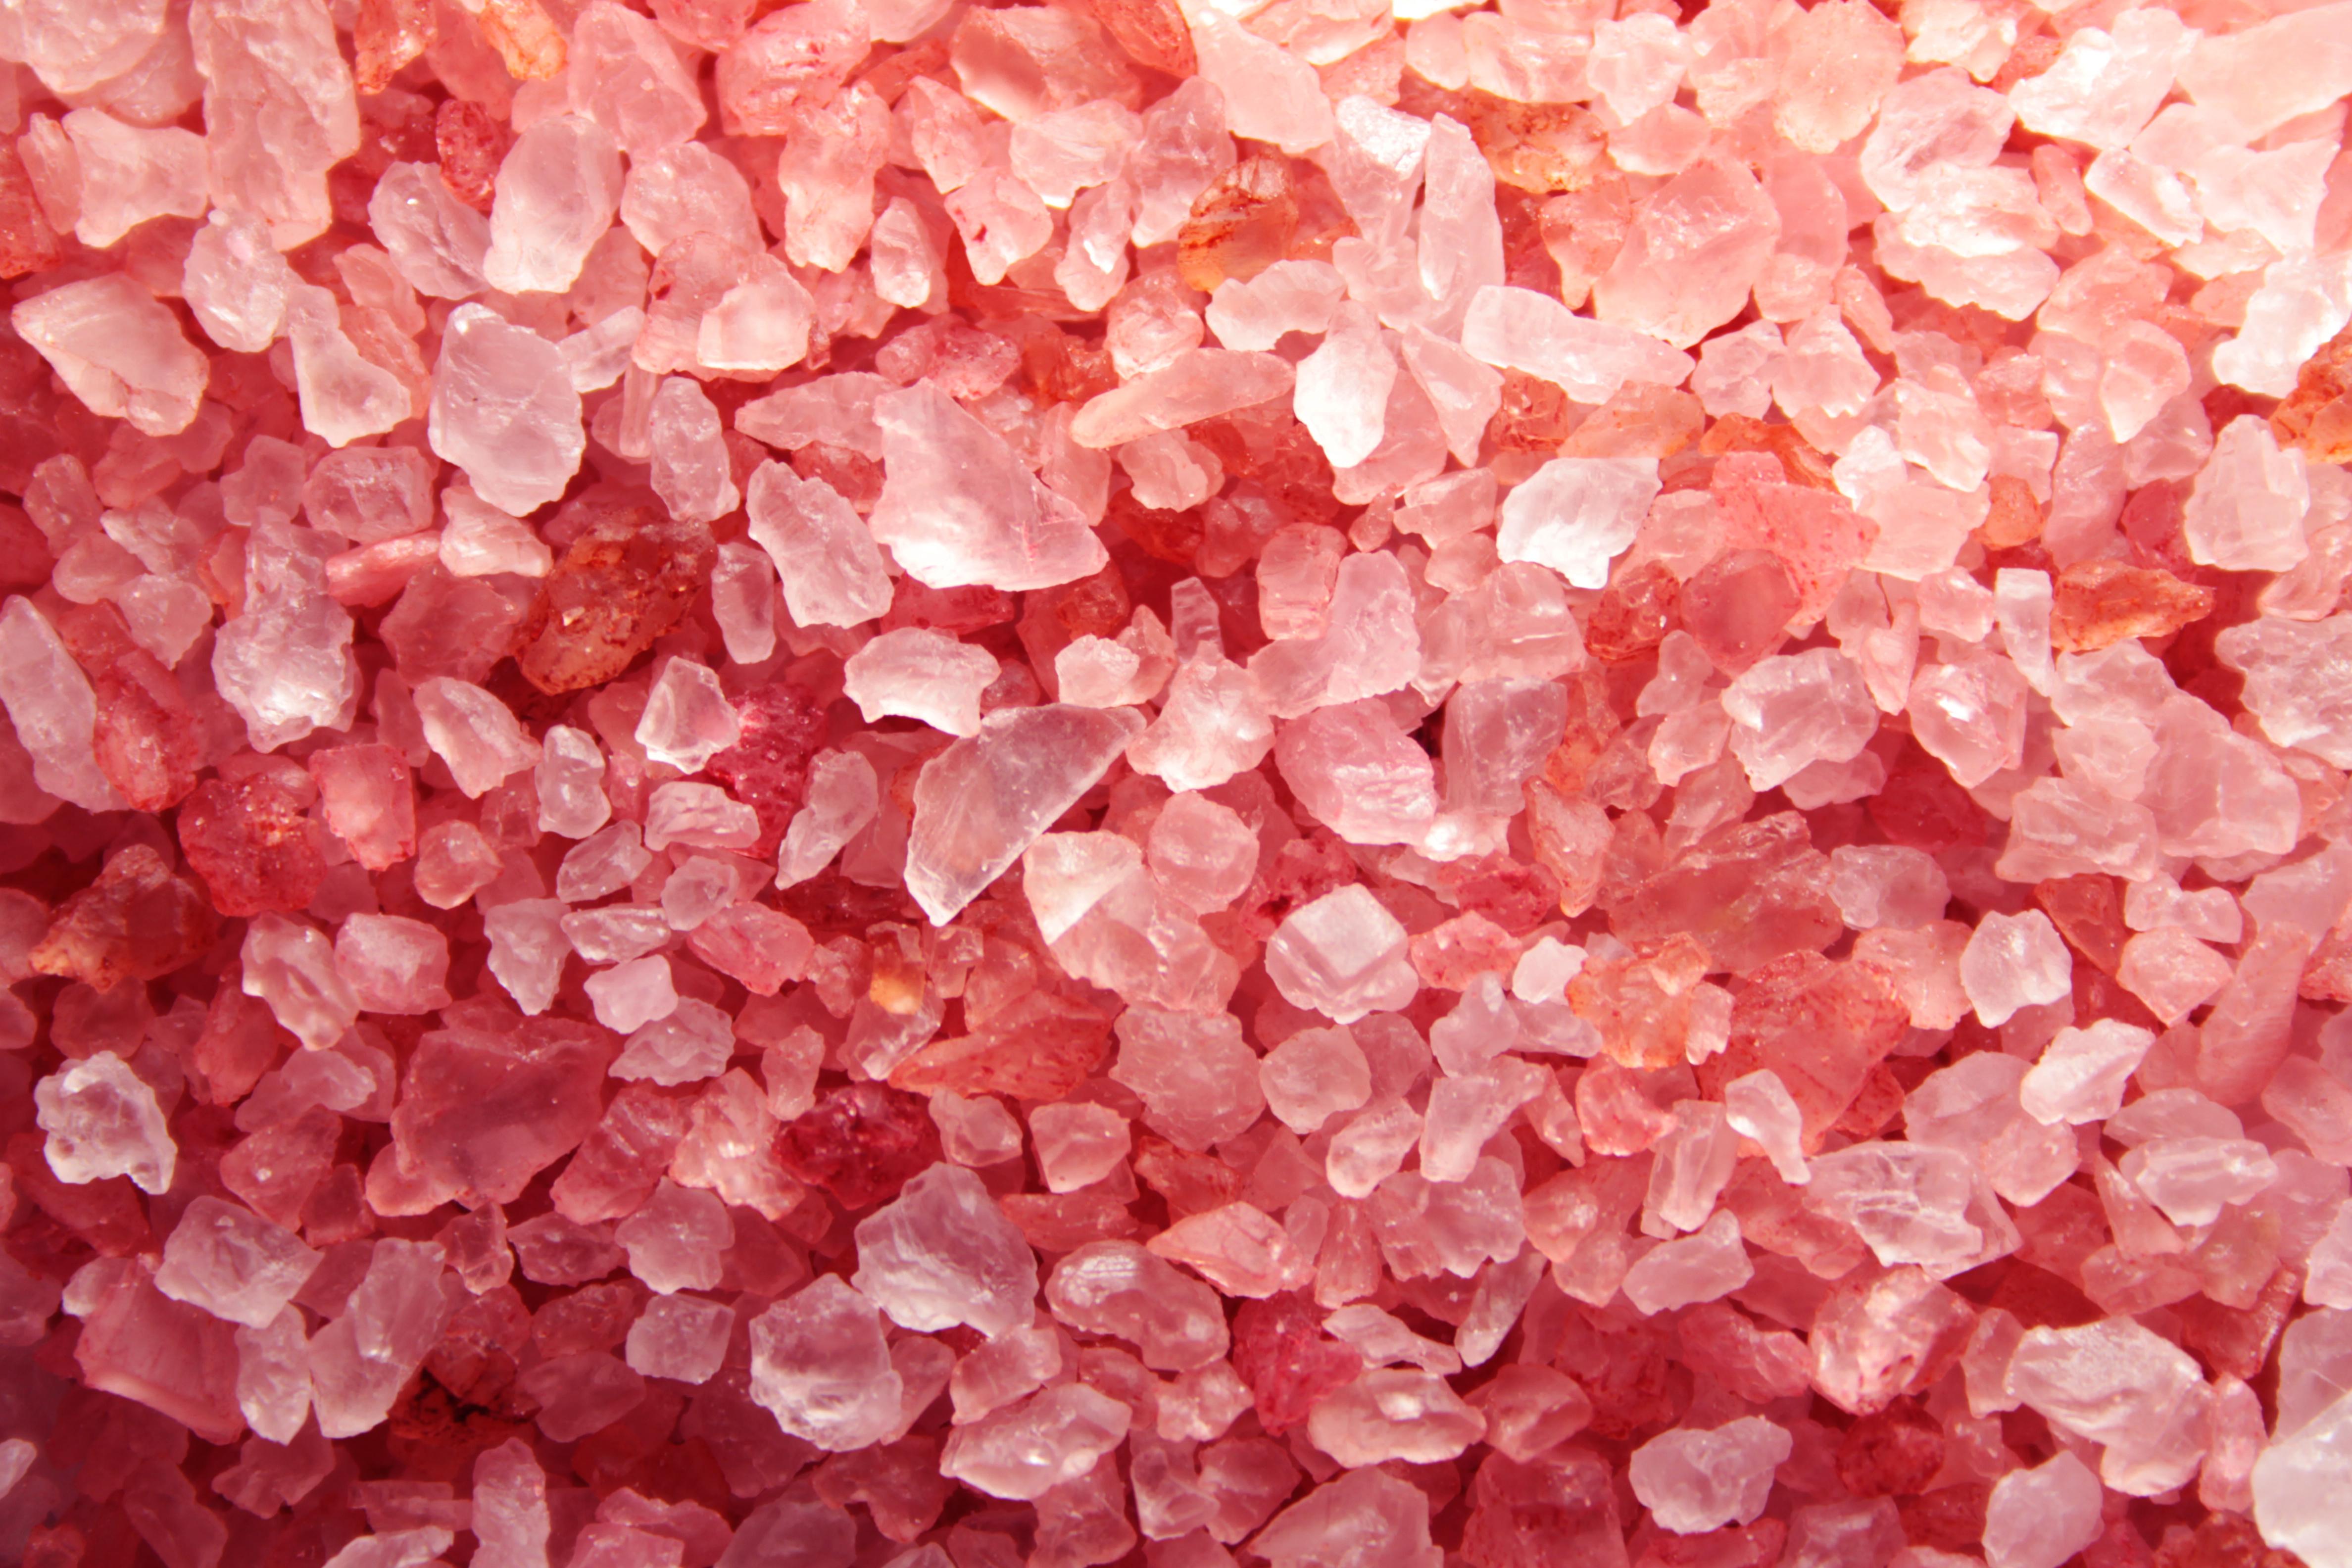 Himalájská sůl hrubozrná růžová 500g